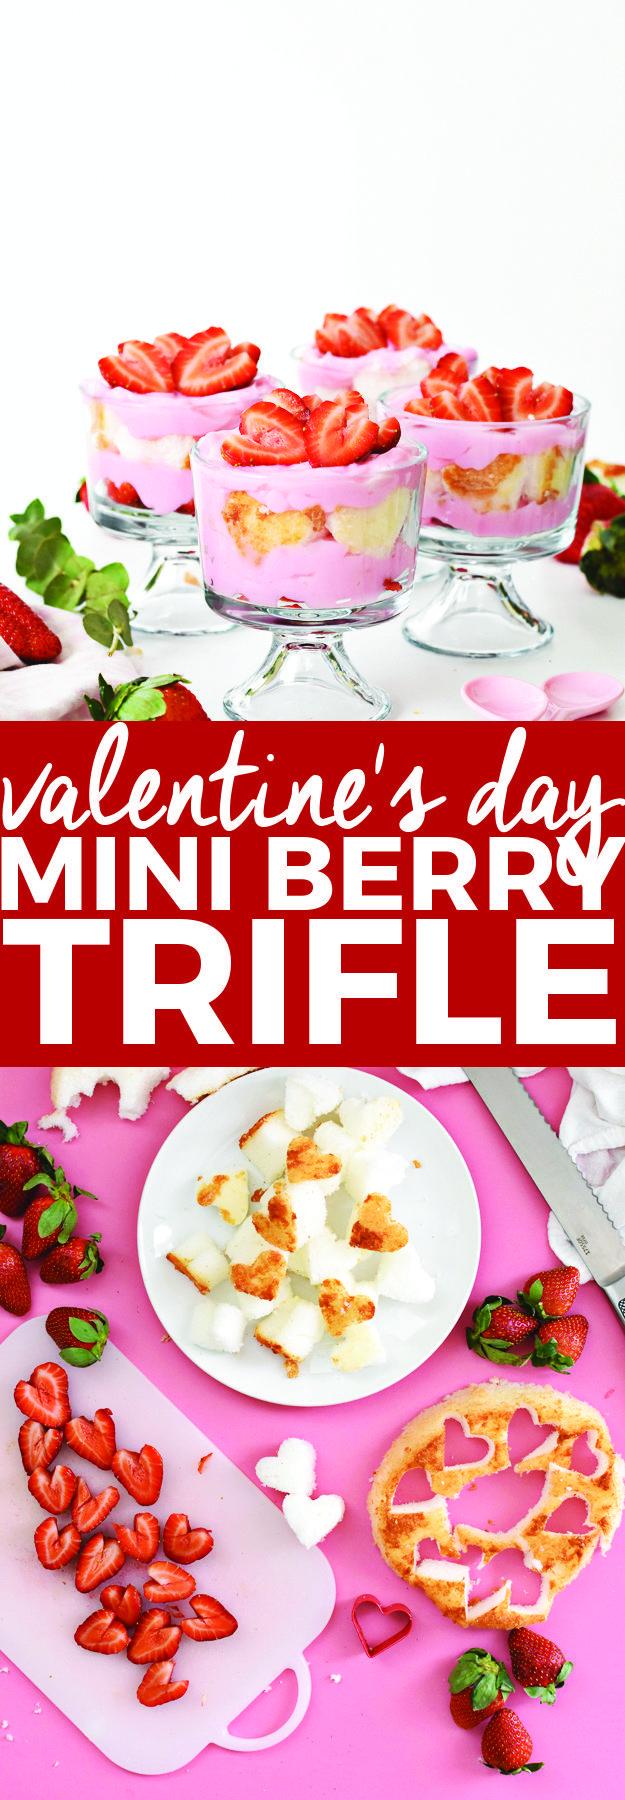 Valentine's Day Mini Berry Trifle | Valentine's Day desserts, Valentine's Day treats, easy trifle recipes, homemade dessert recipes, berry trifle recipe || The Butter Half #berrytrifle #triflerecipe #valentinesday via @thebutterhalf